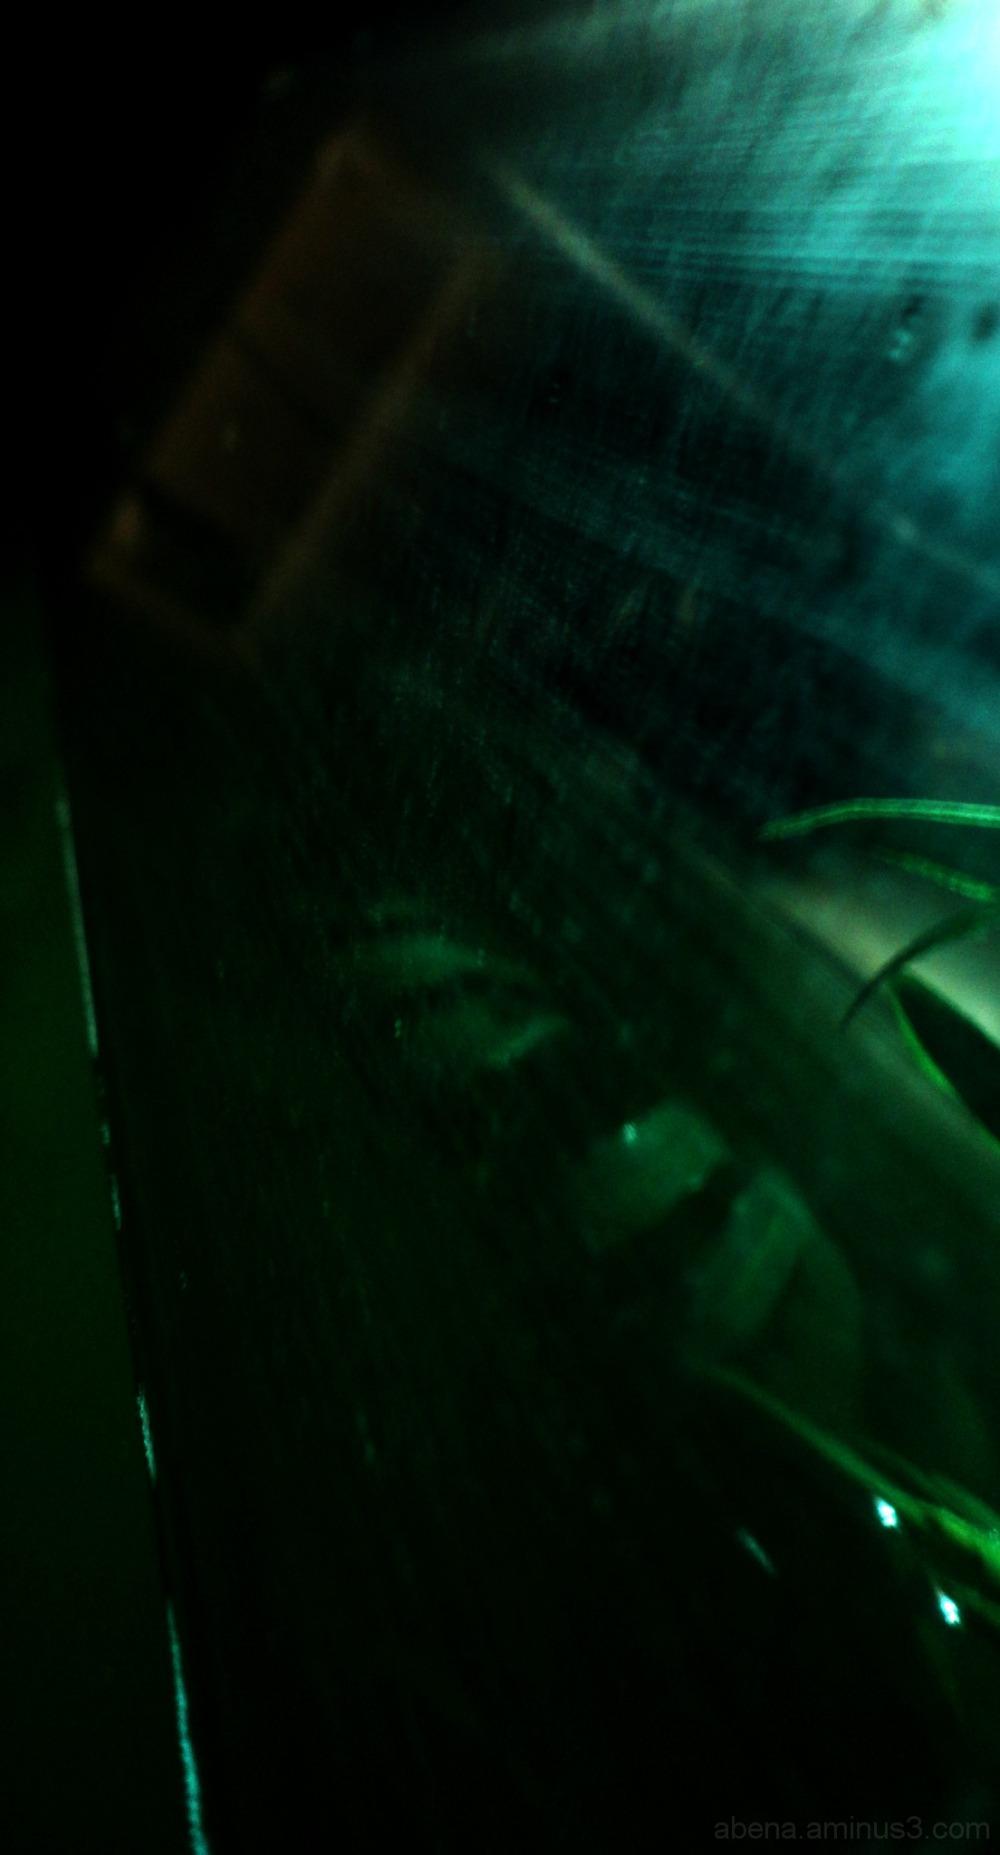 2. Night time fish tank obsession